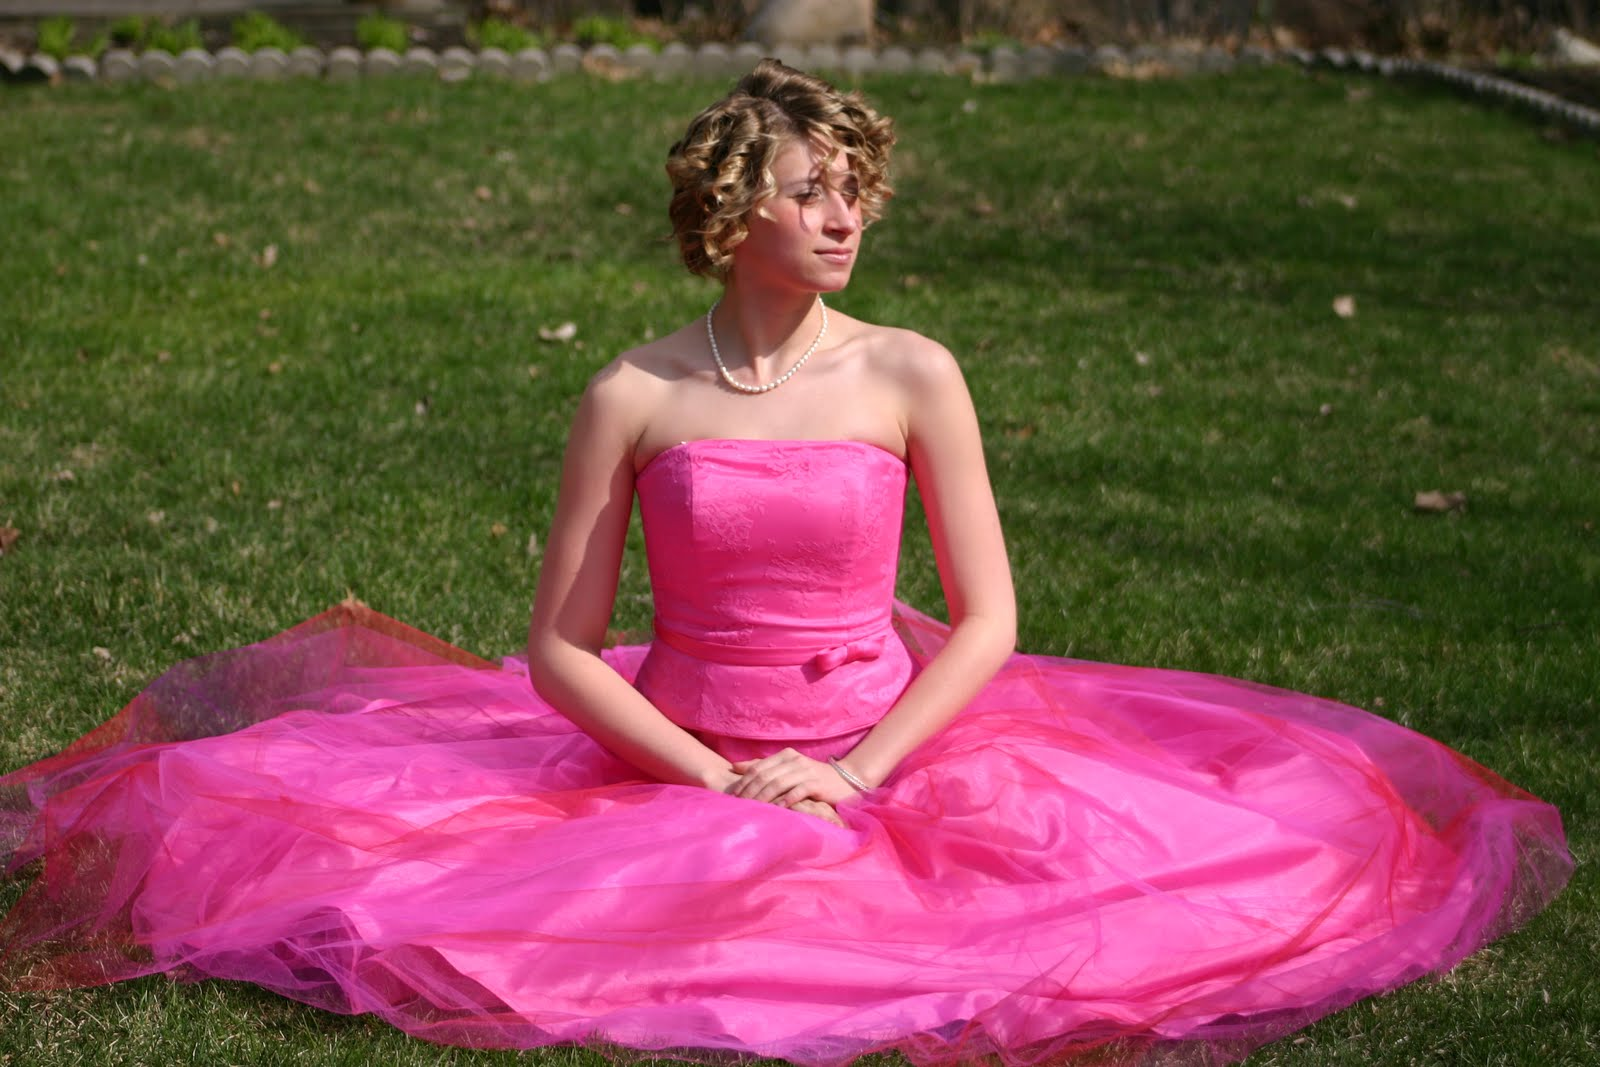 big puffy wedding dress big puffy wedding dresses big puffy wedding dresses So i got a big puffy pink